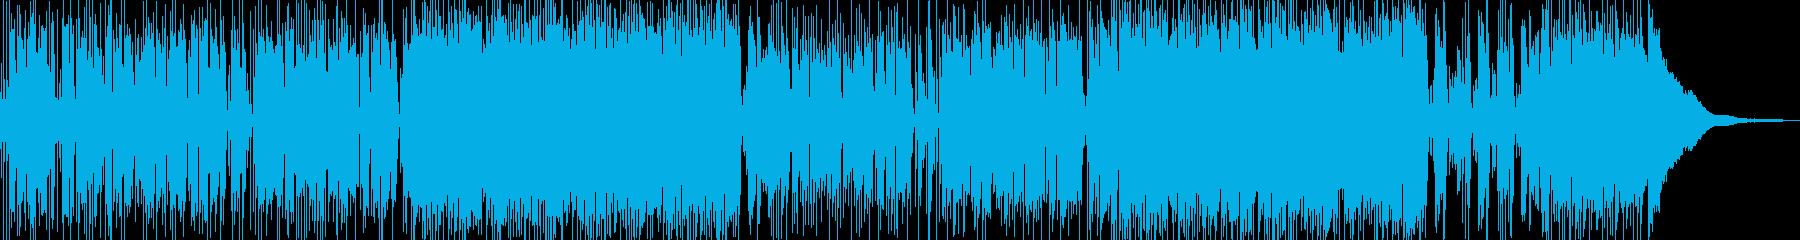 ❶GtPf生演奏♫フレンチなボサノバの再生済みの波形